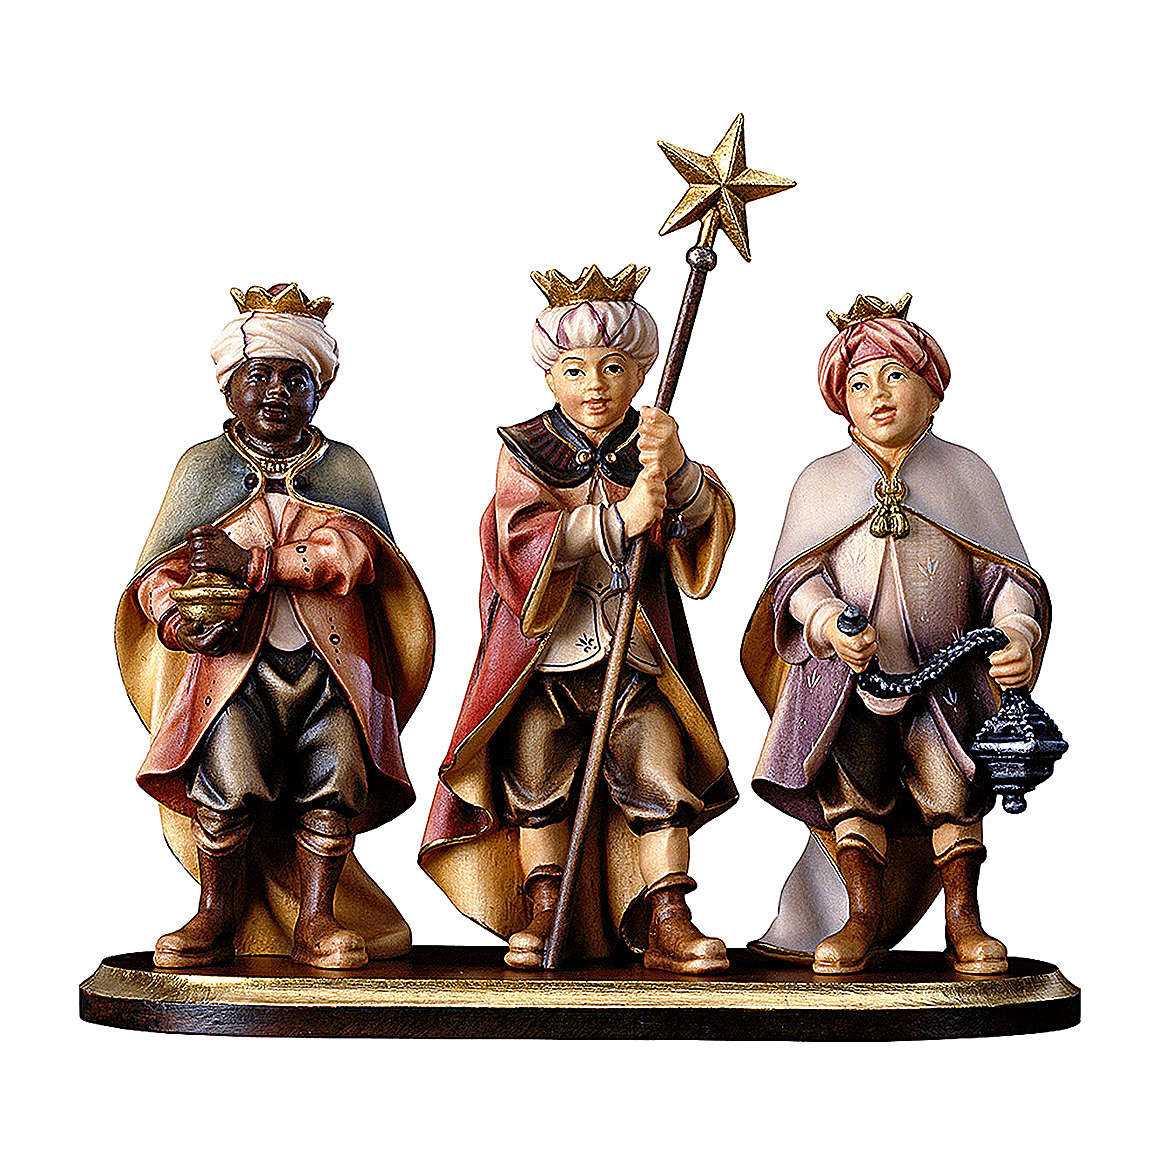 3 piccoli cantori su piedistallo presepe Original legno dipinto in Valgardena 10 cm 4